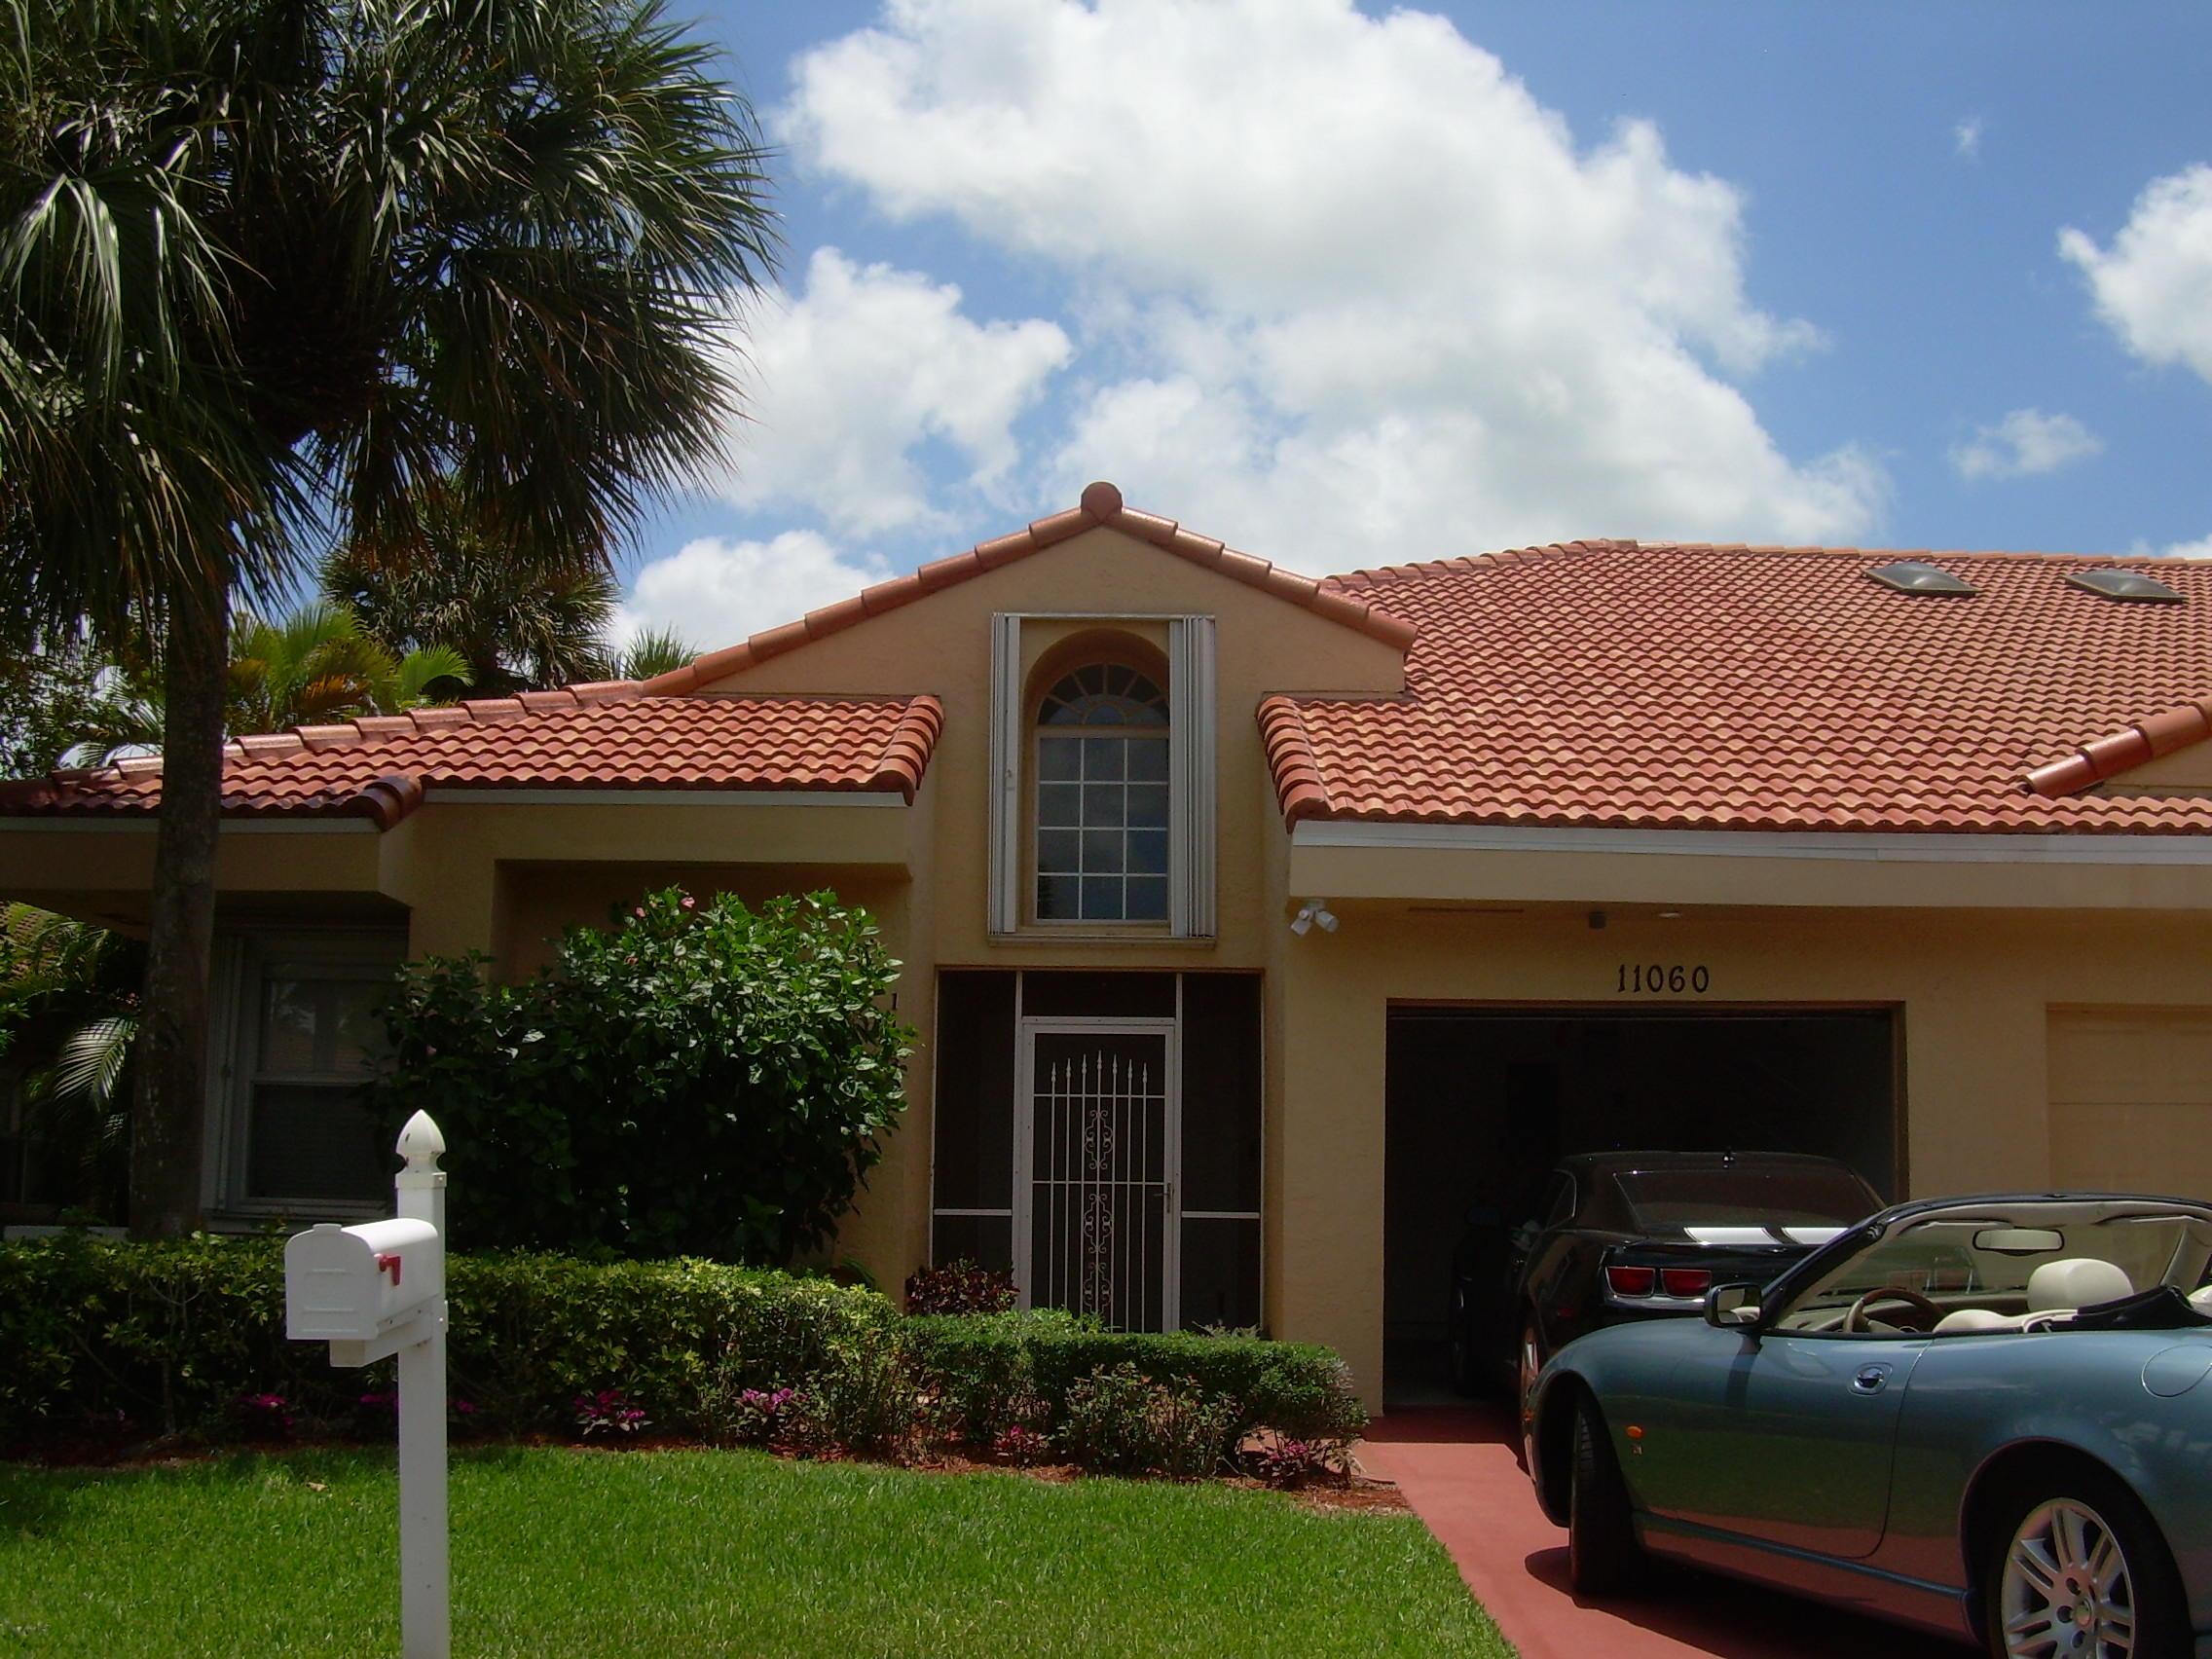 11060 180th Court S, Boca Raton, FL 33498